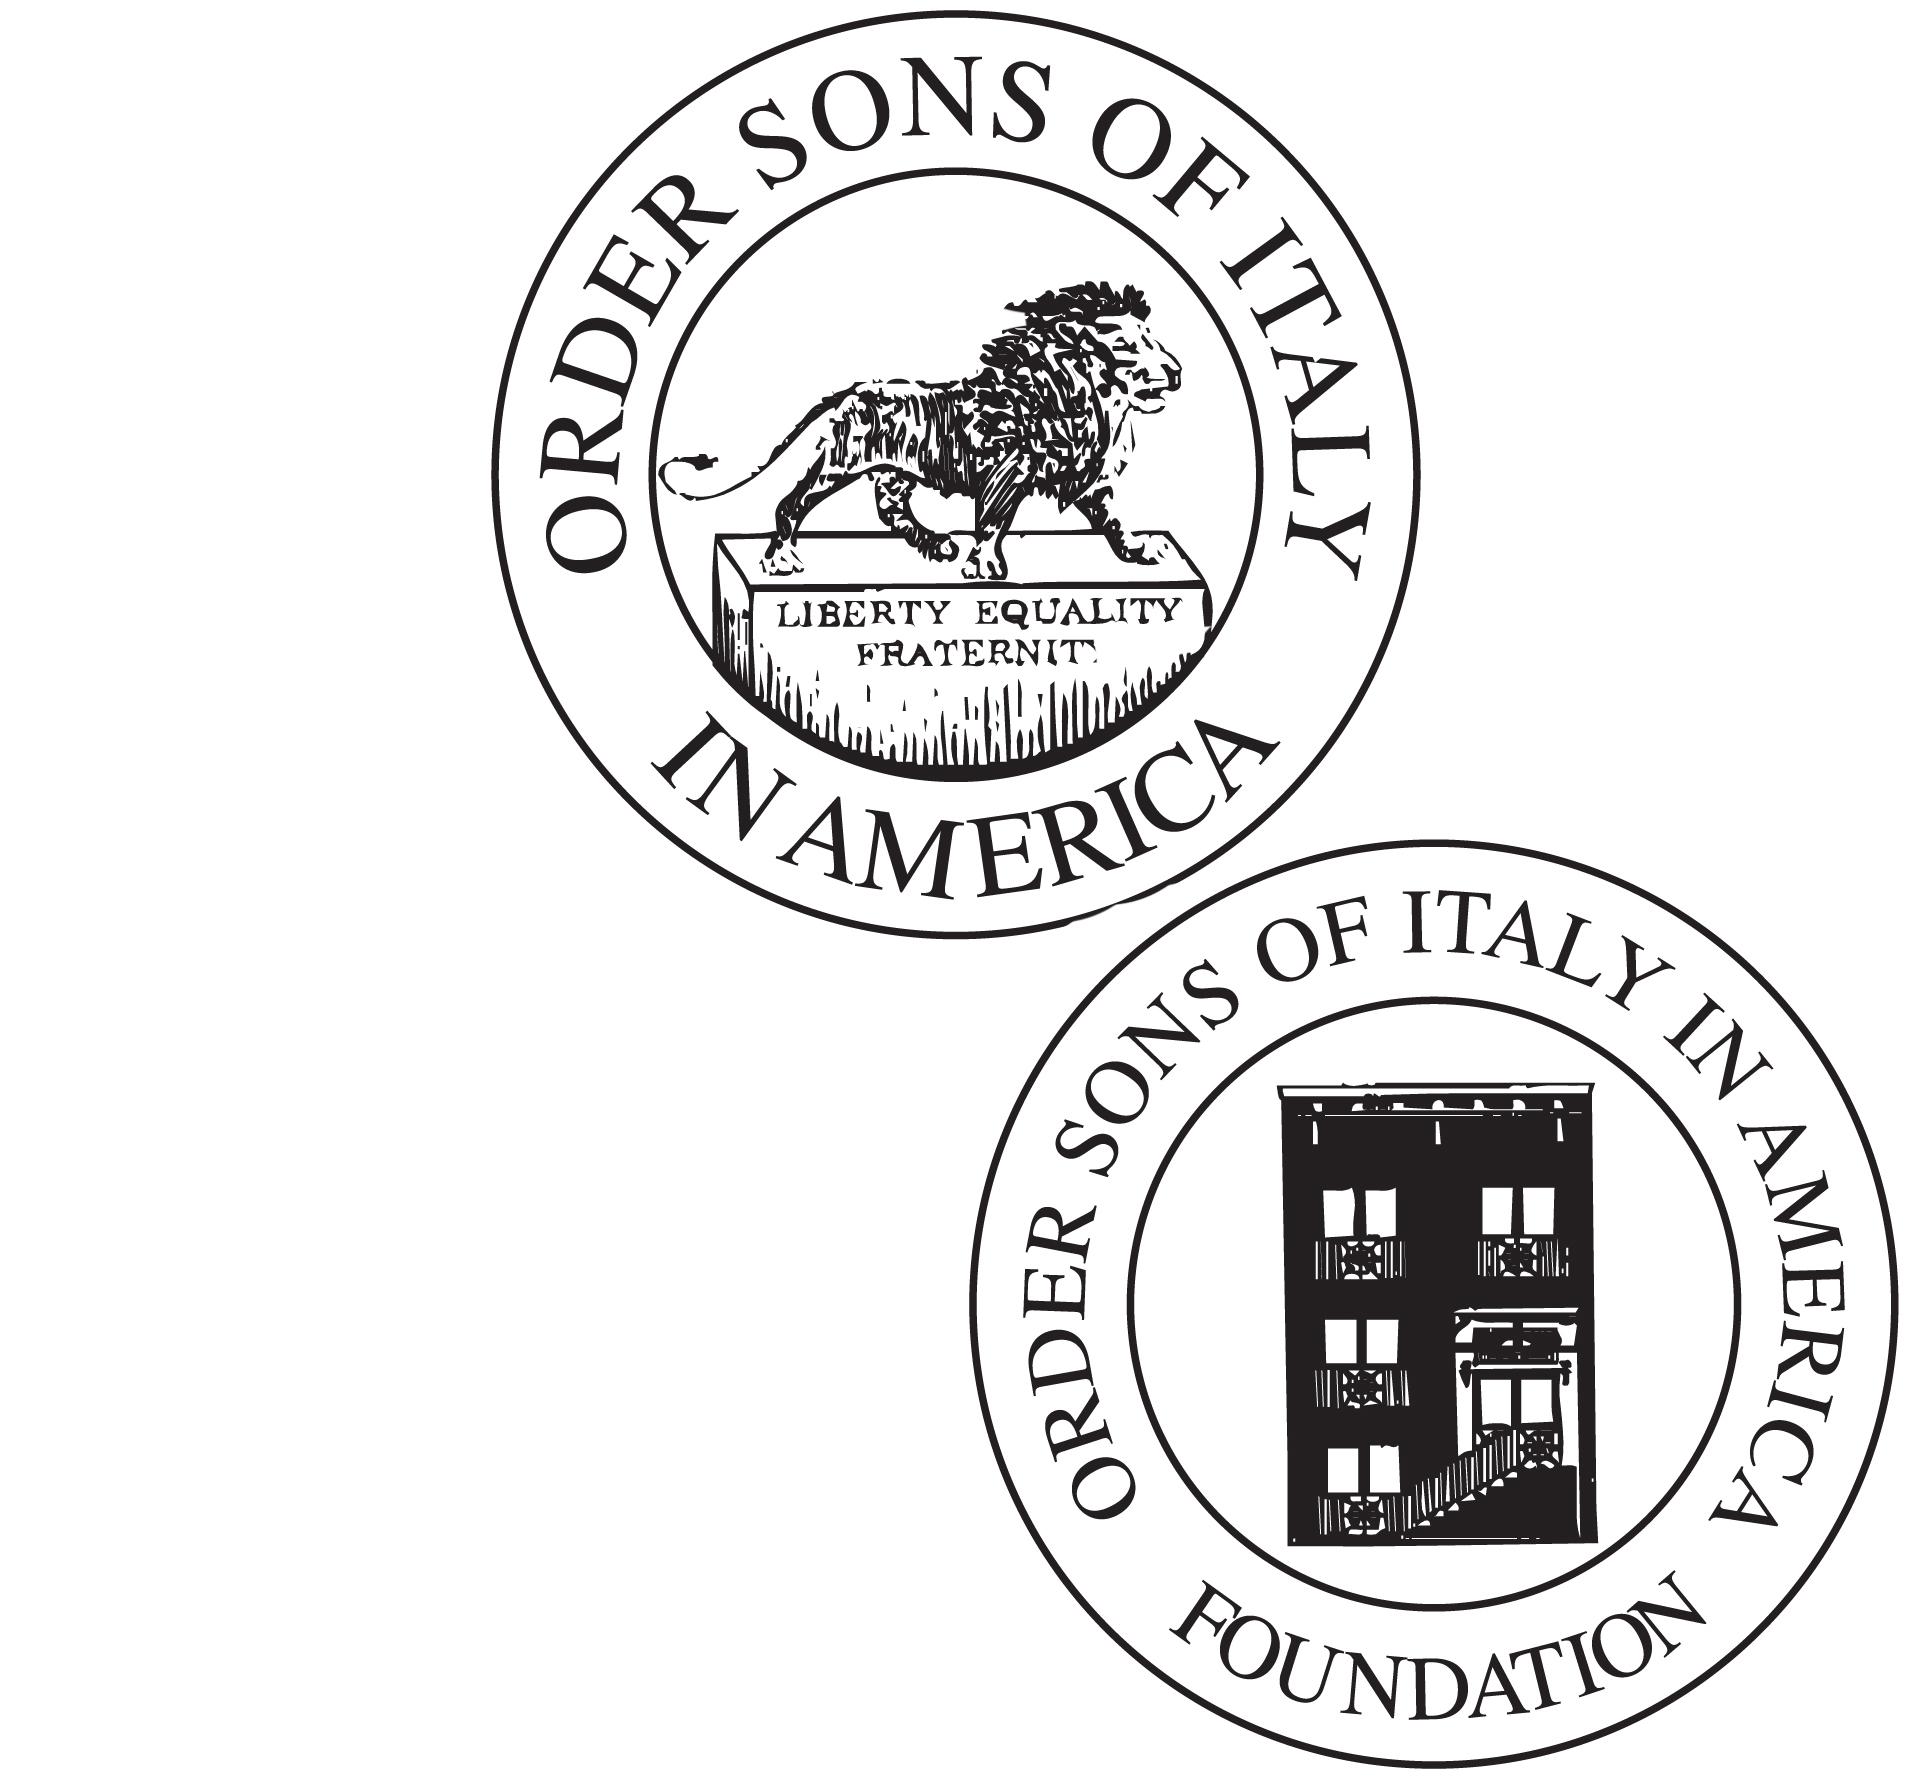 Sons_of_Italy.jpg